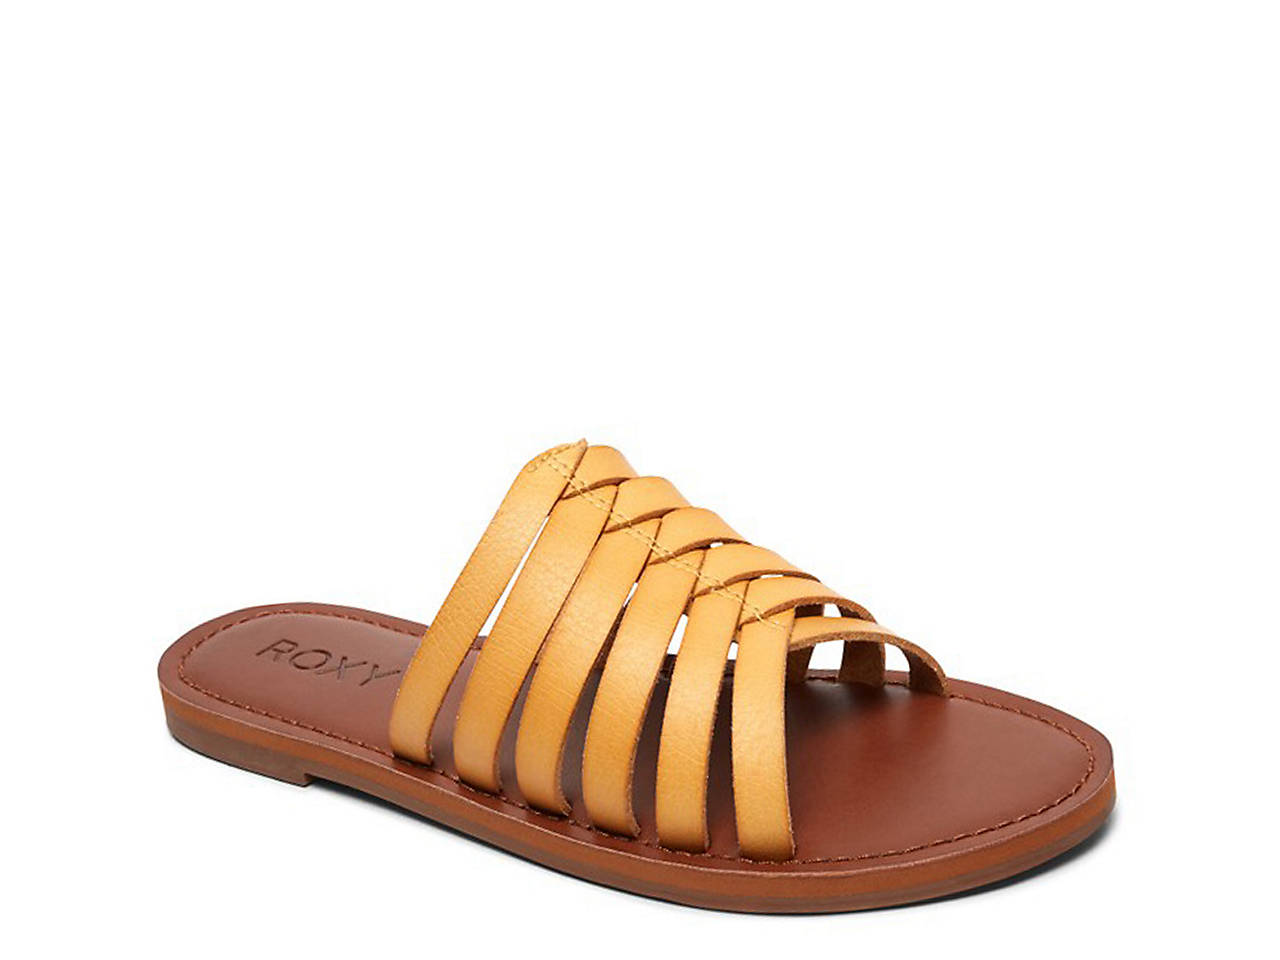 f309ca5745b60c Roxy Sybil Sandal Women s Shoes